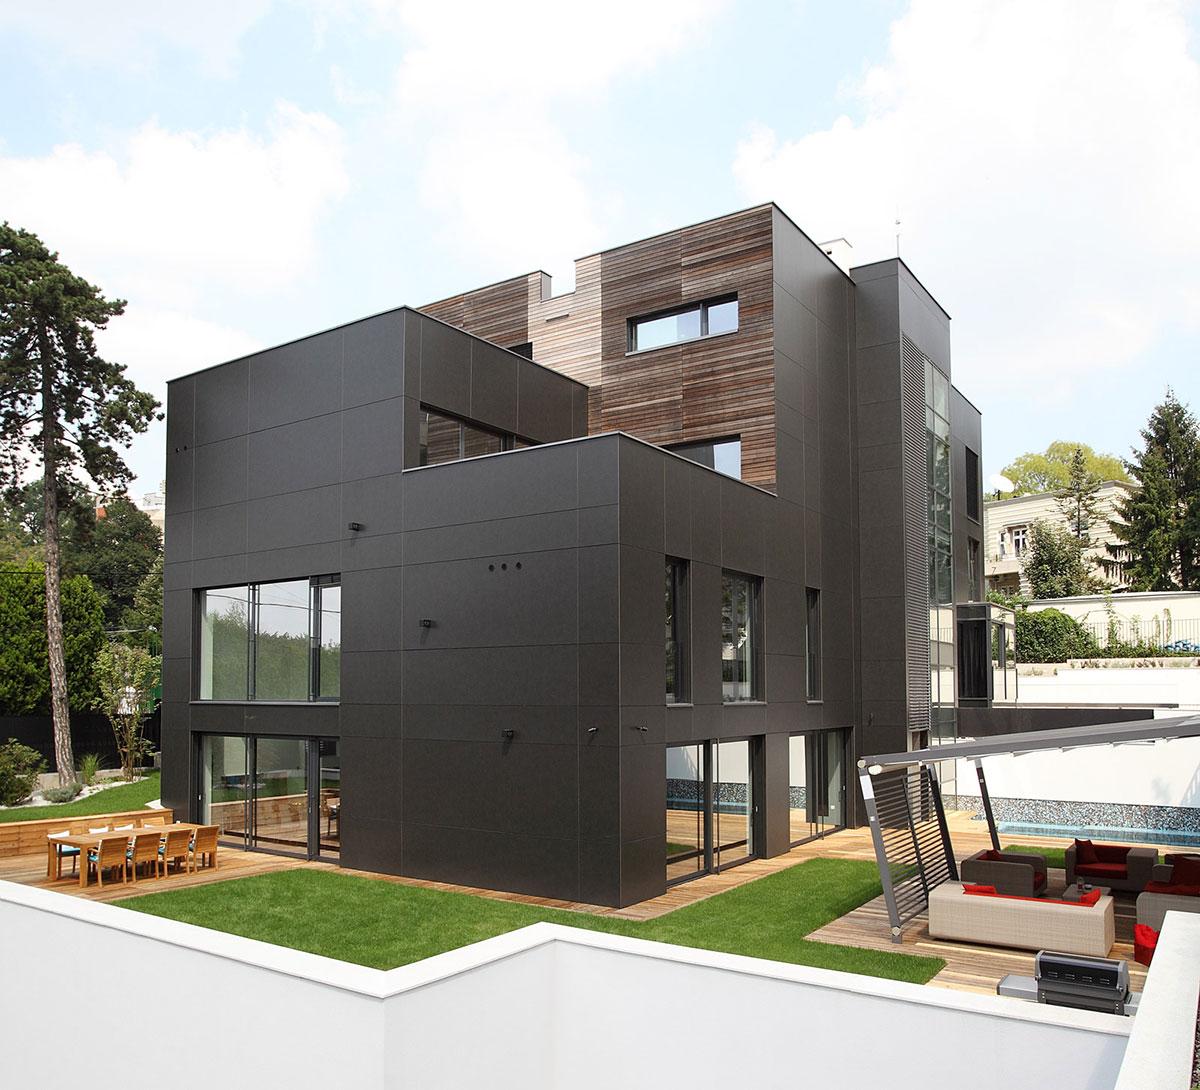 2017_Salon-arhitekture_3-1a-Priznanje-ARHITEKTURA-Cagic